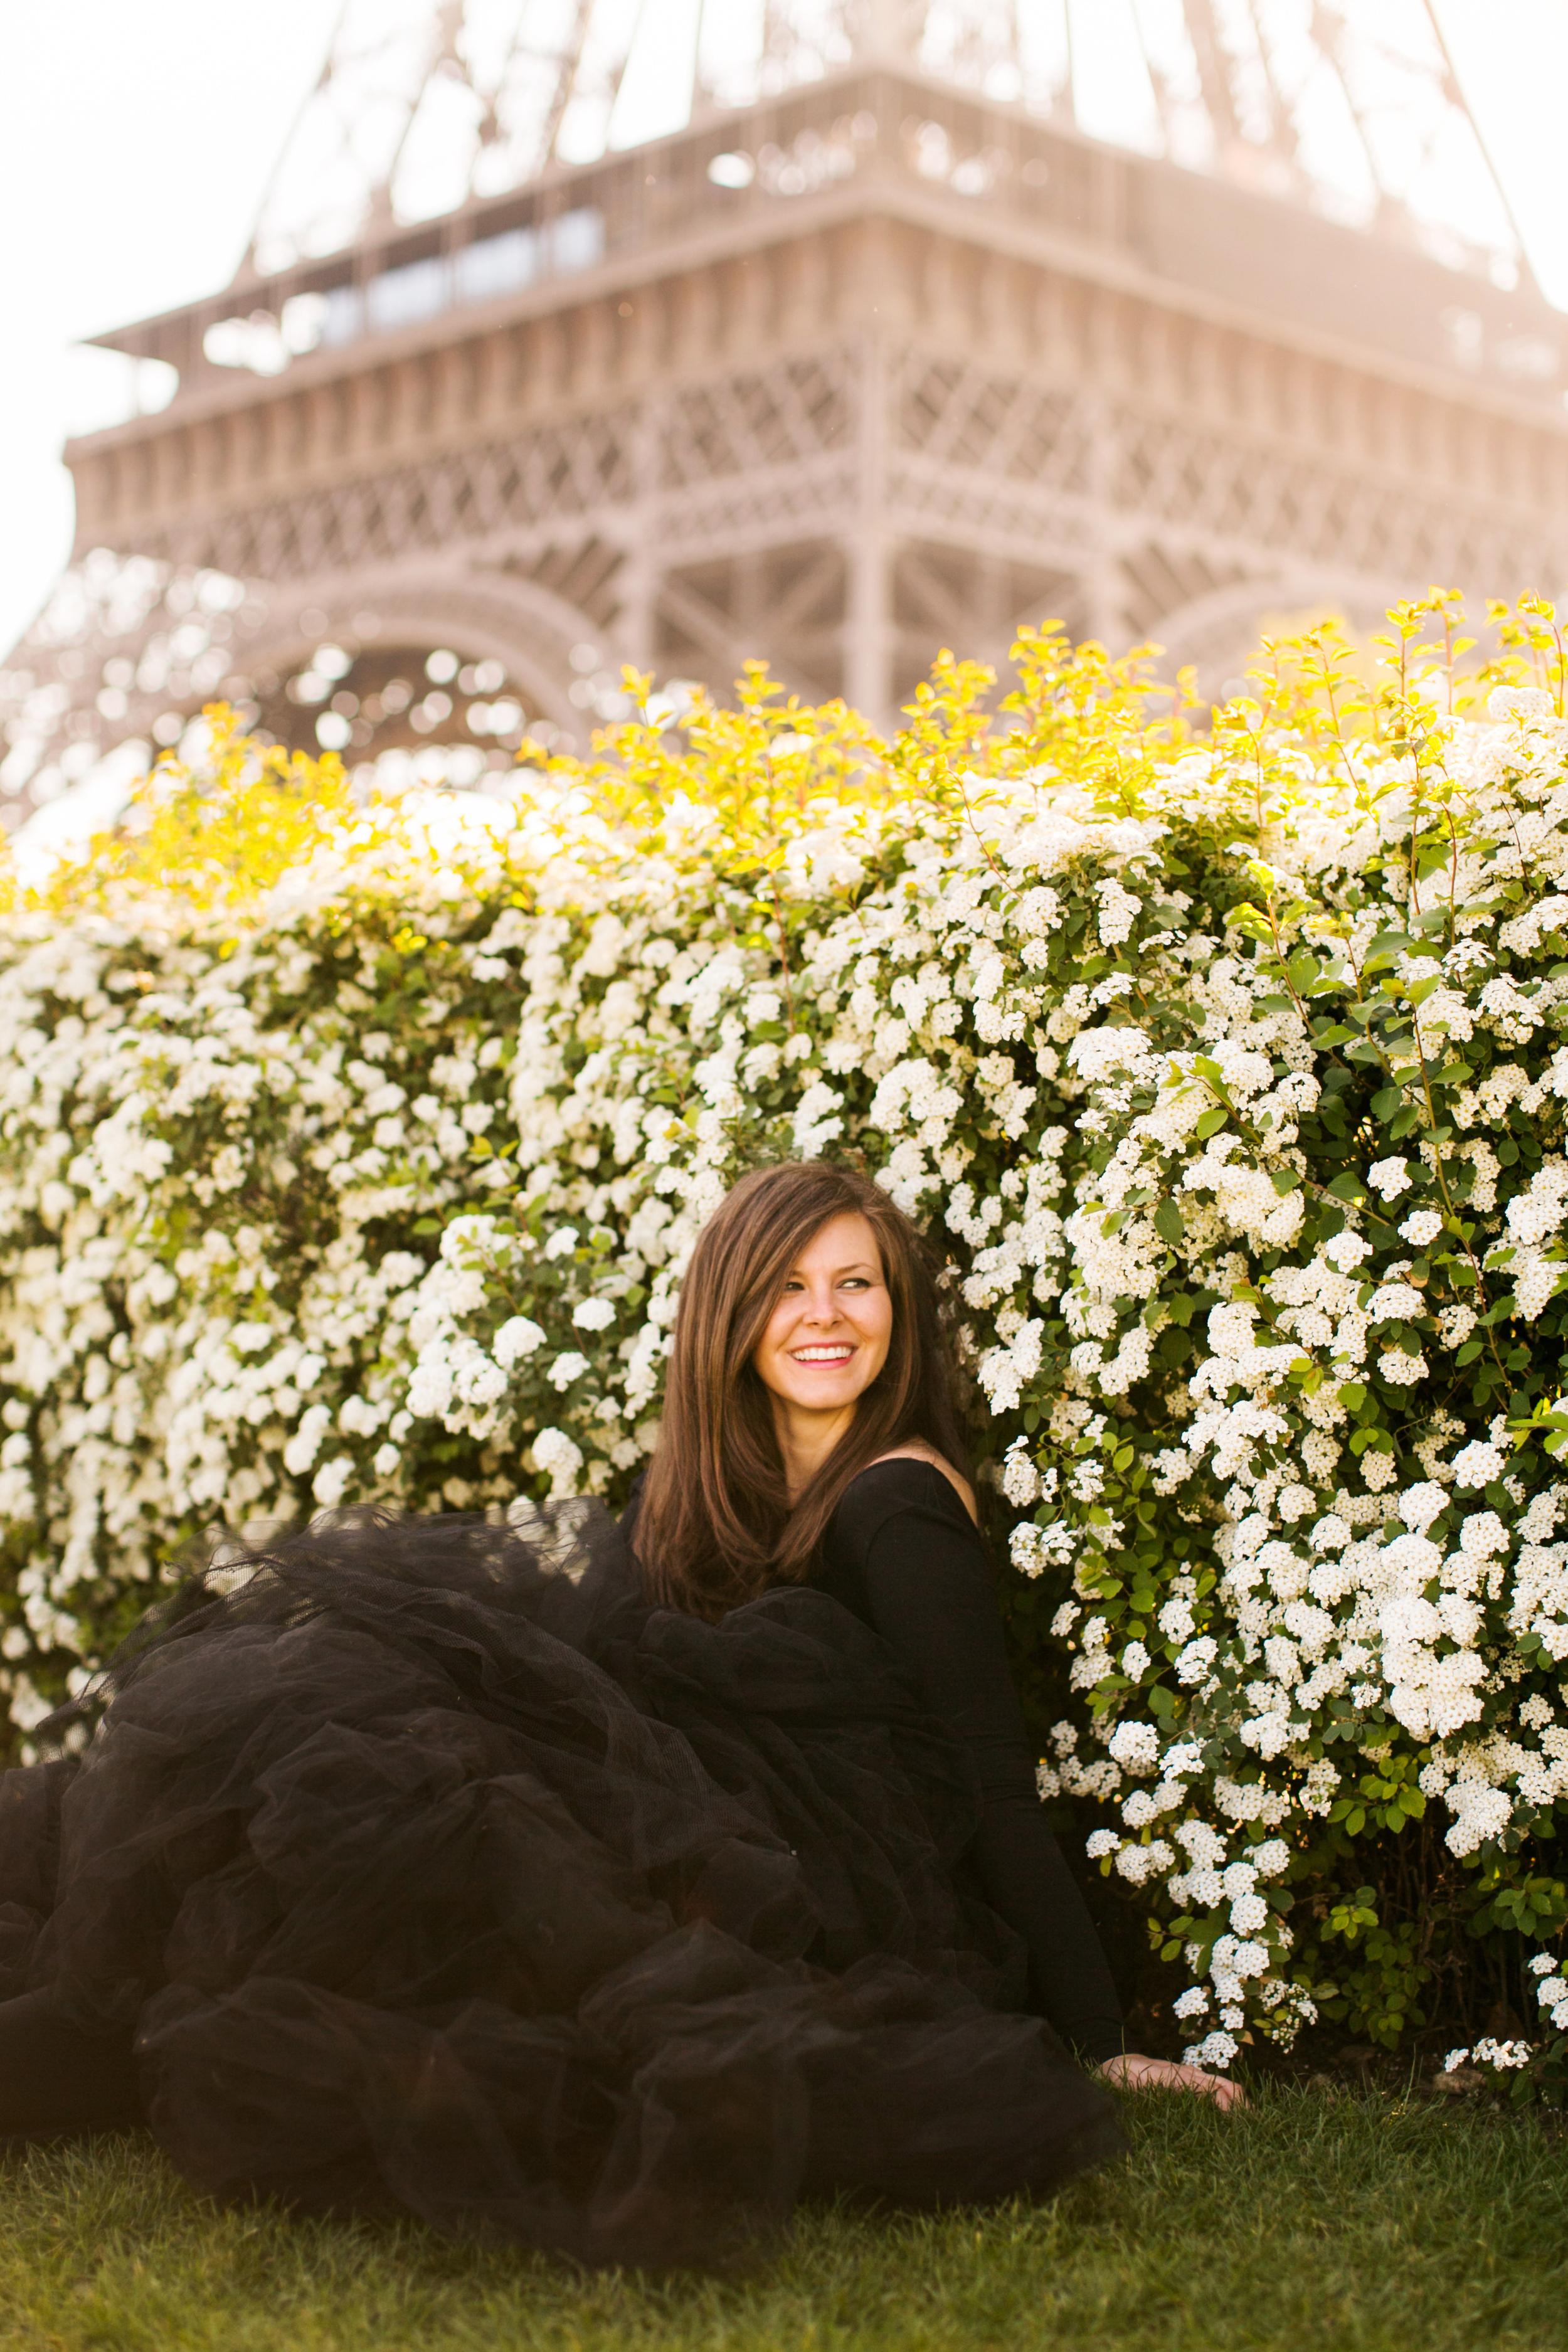 parisian_photographer_eiffel_tower_aspiring_kennedy